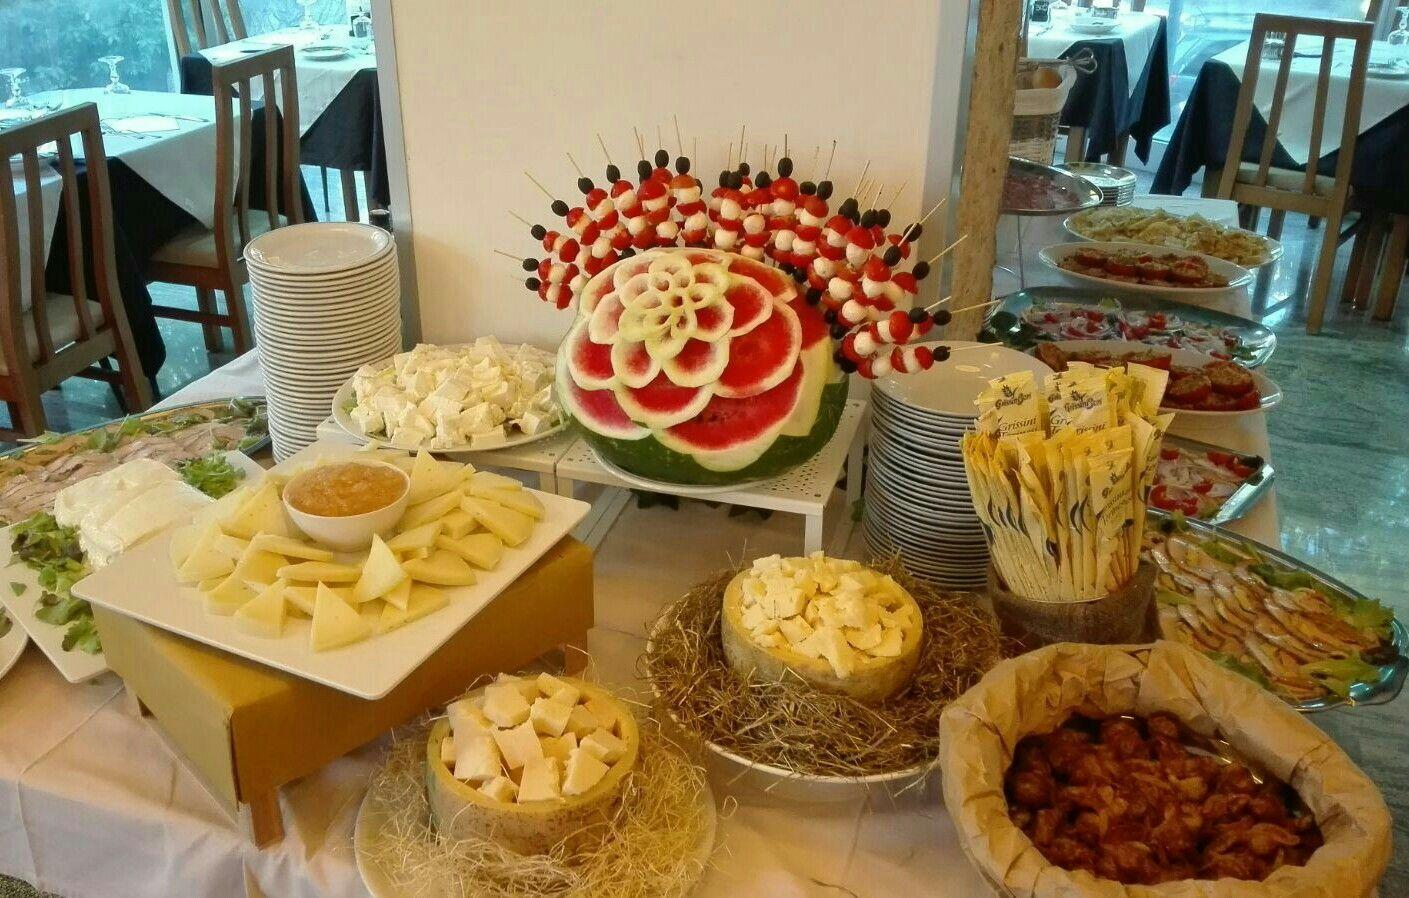 #romagna #food #italy